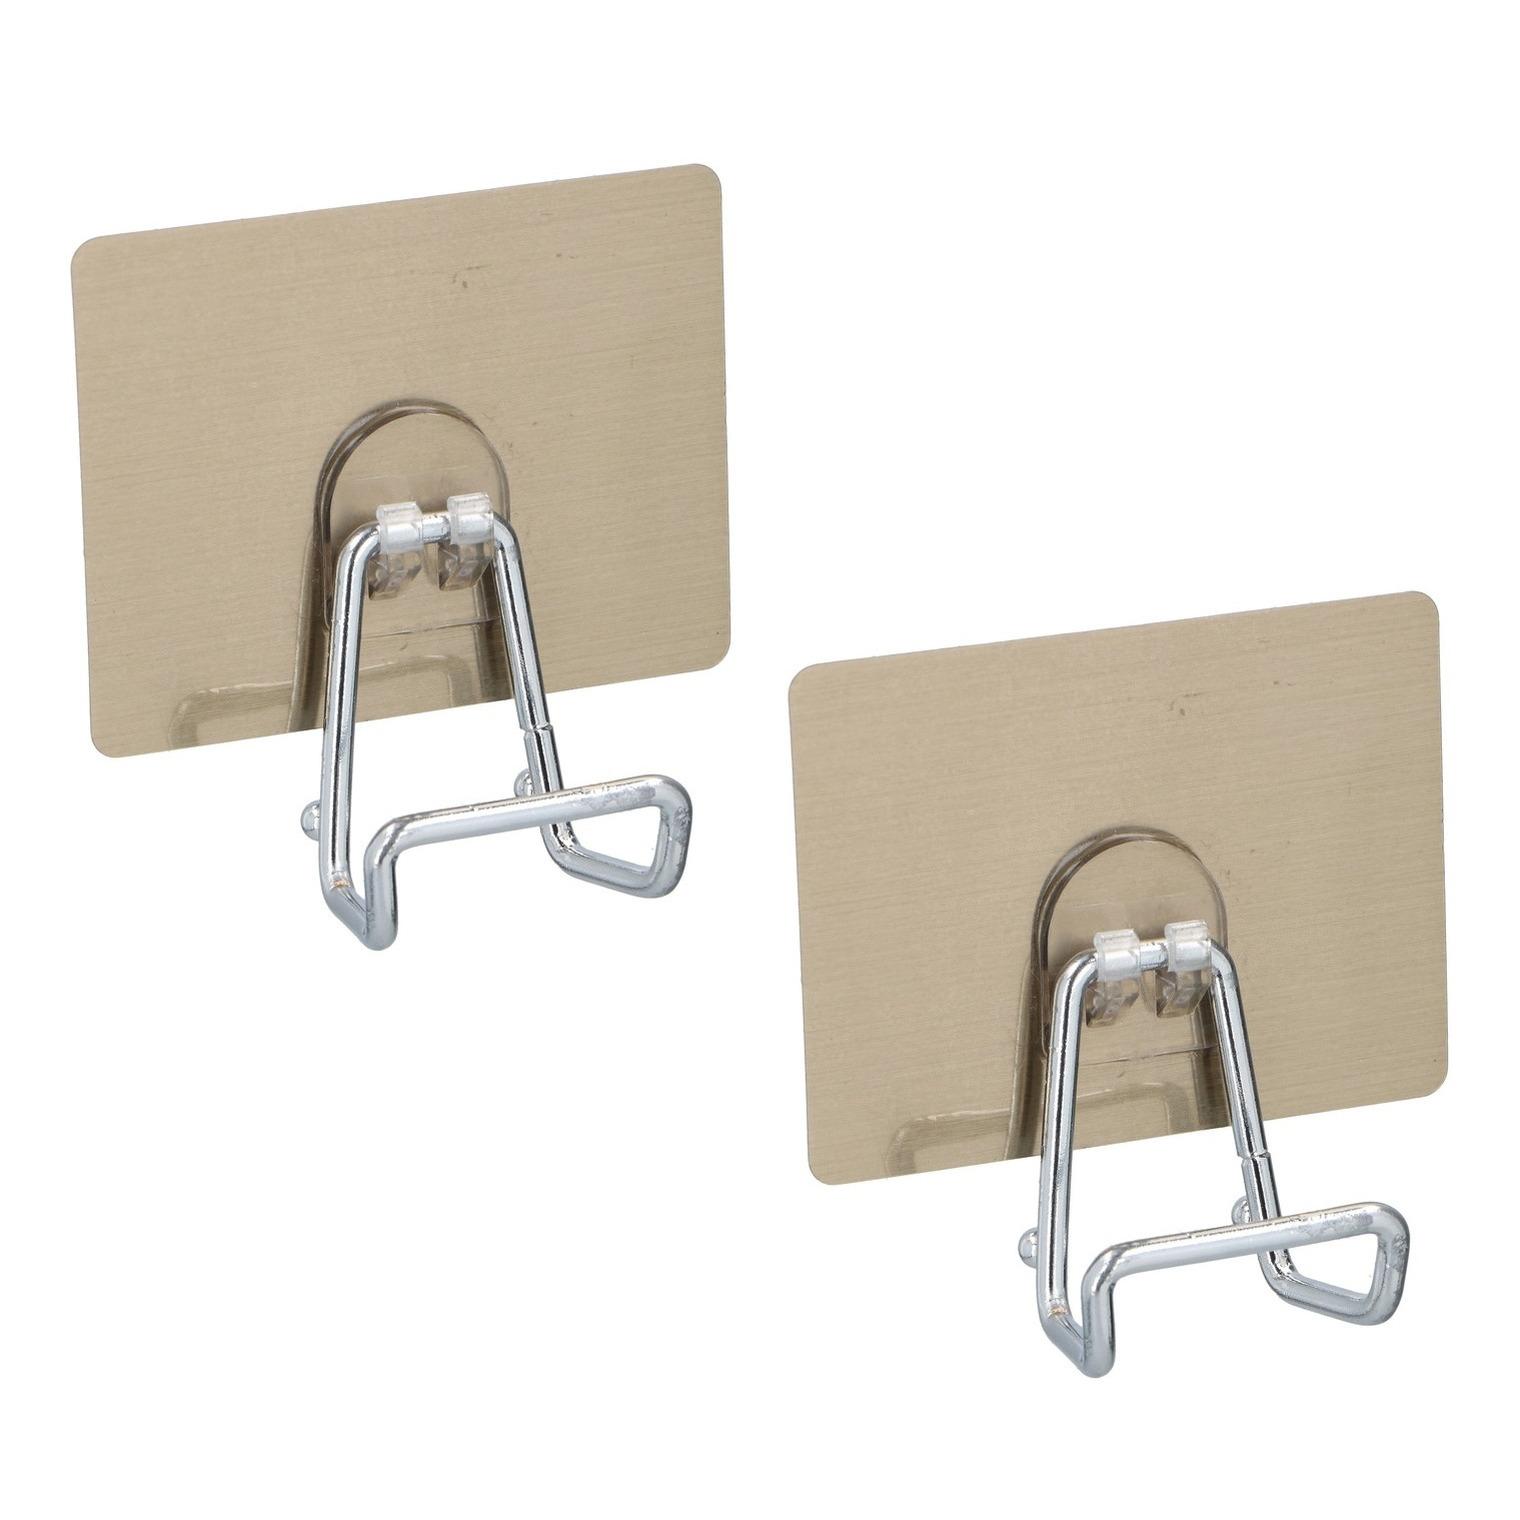 3x stuks zelfklevende badkamer handdoek ophanghaak 9 5 cm